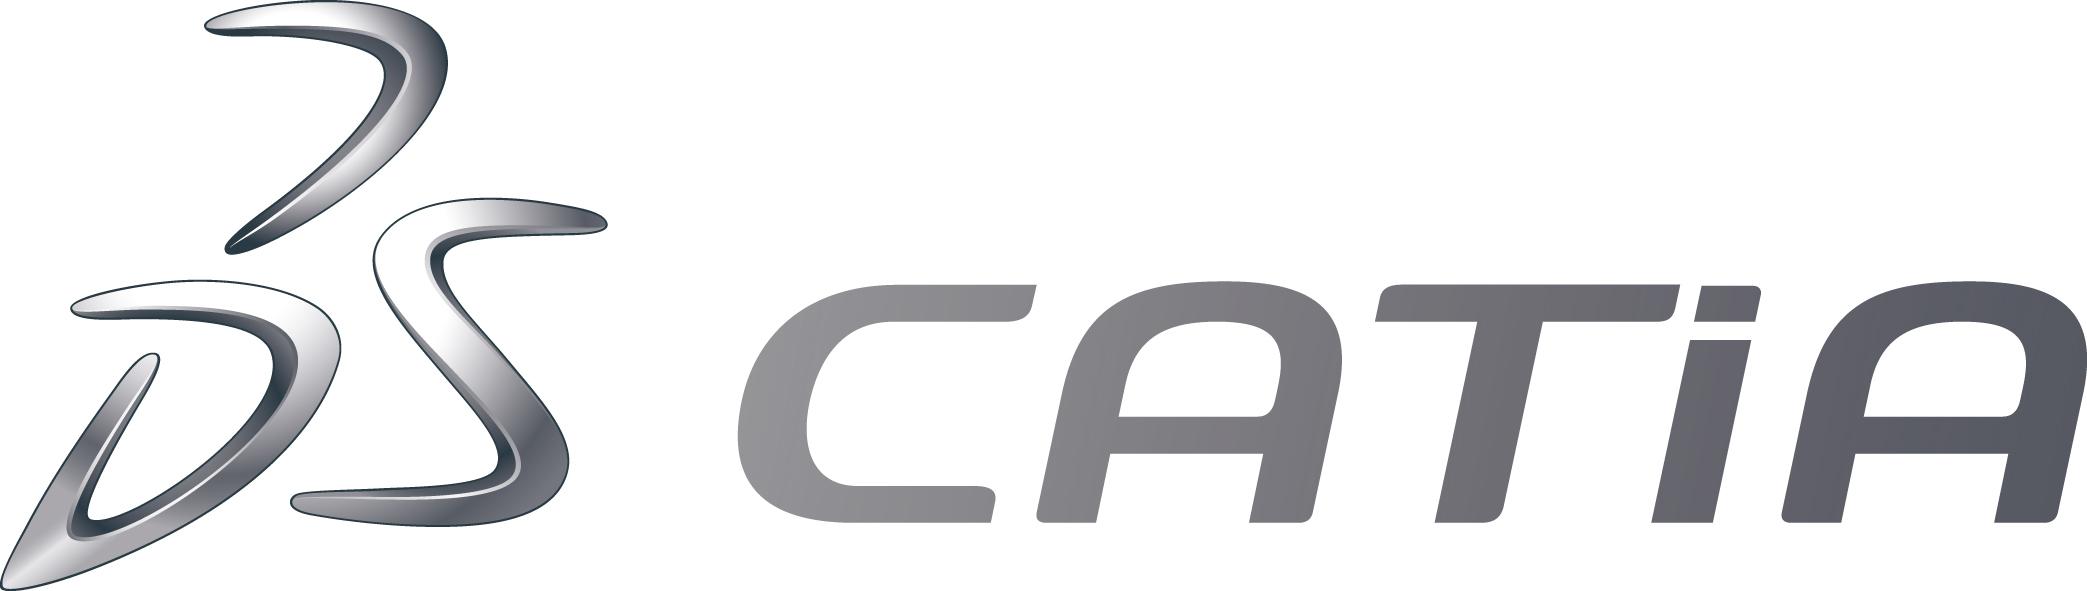 Filelogo catiag wikimedia commons filelogo catiag sciox Gallery